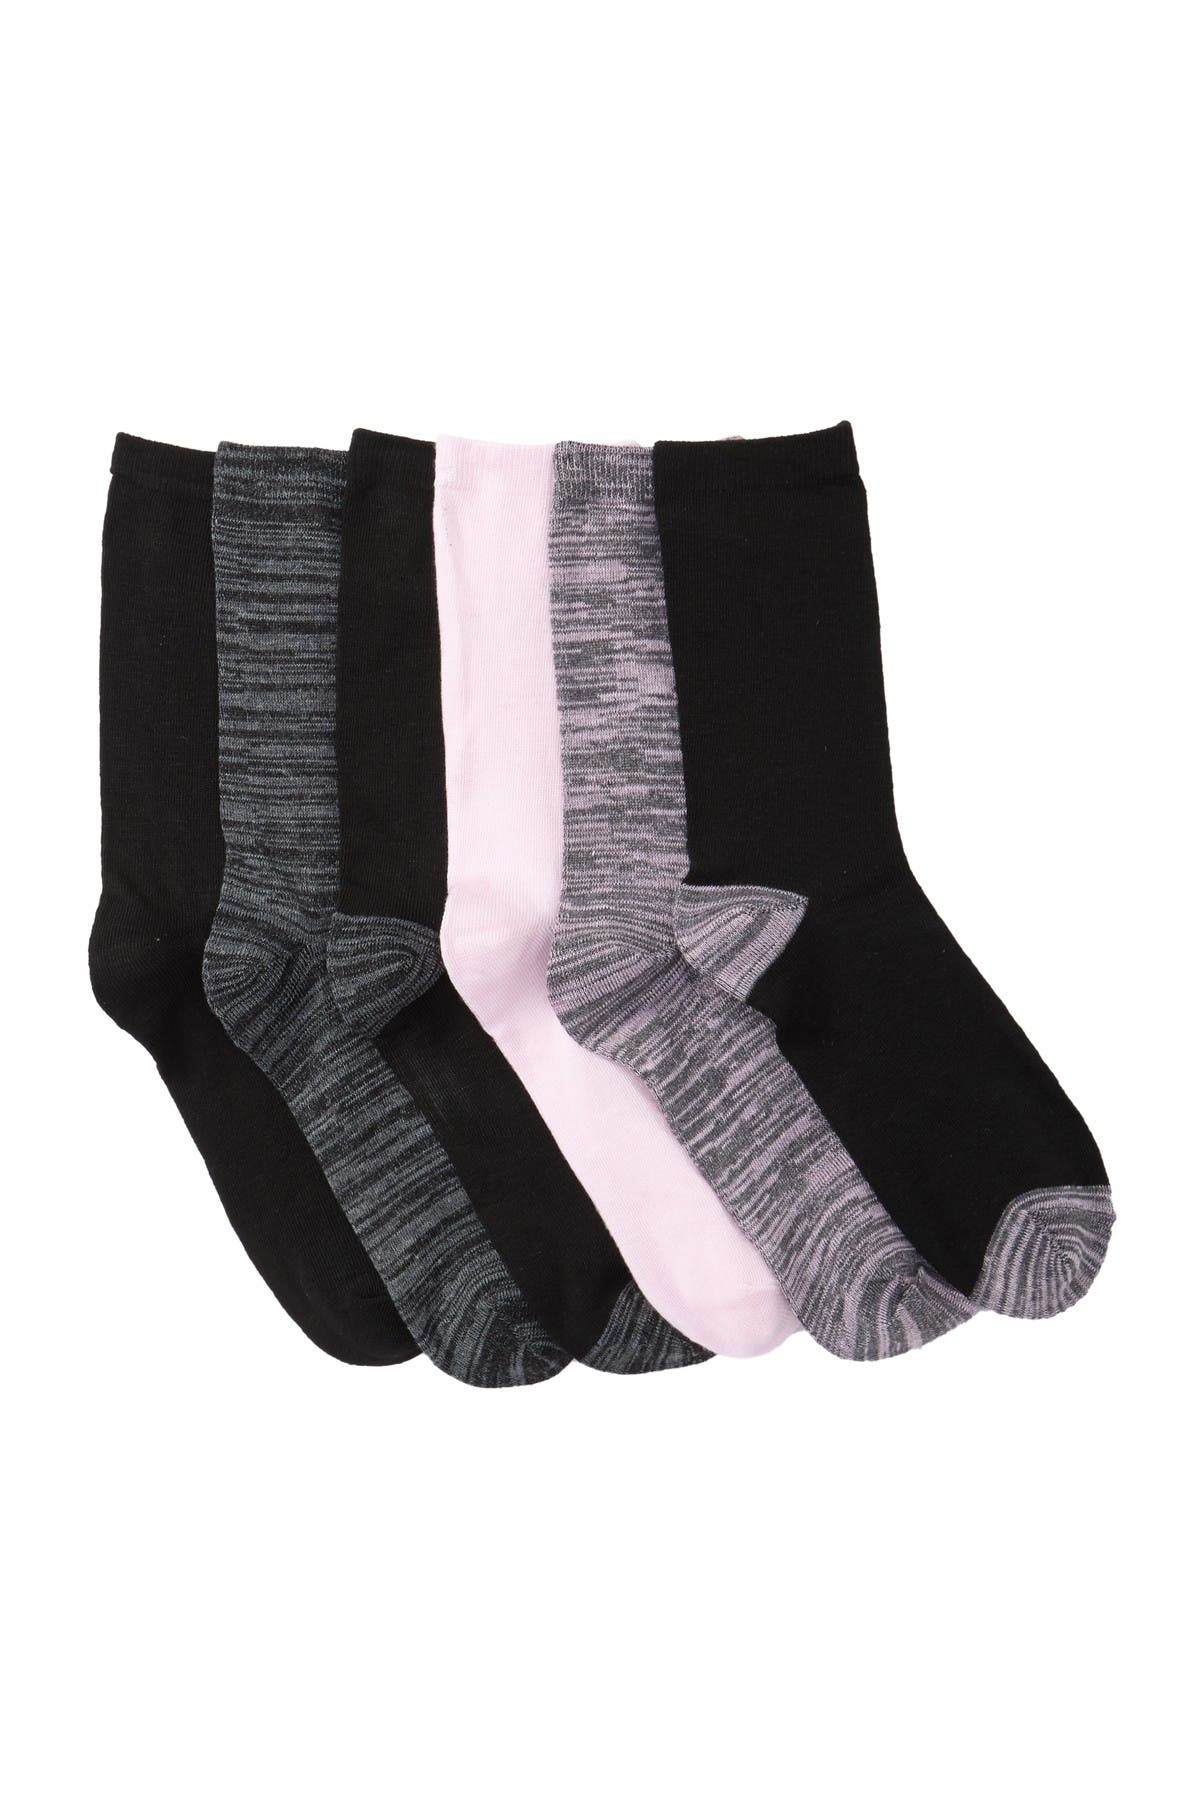 Image of Jessica Simpson Random Knit Crew Socks - Pack of 6